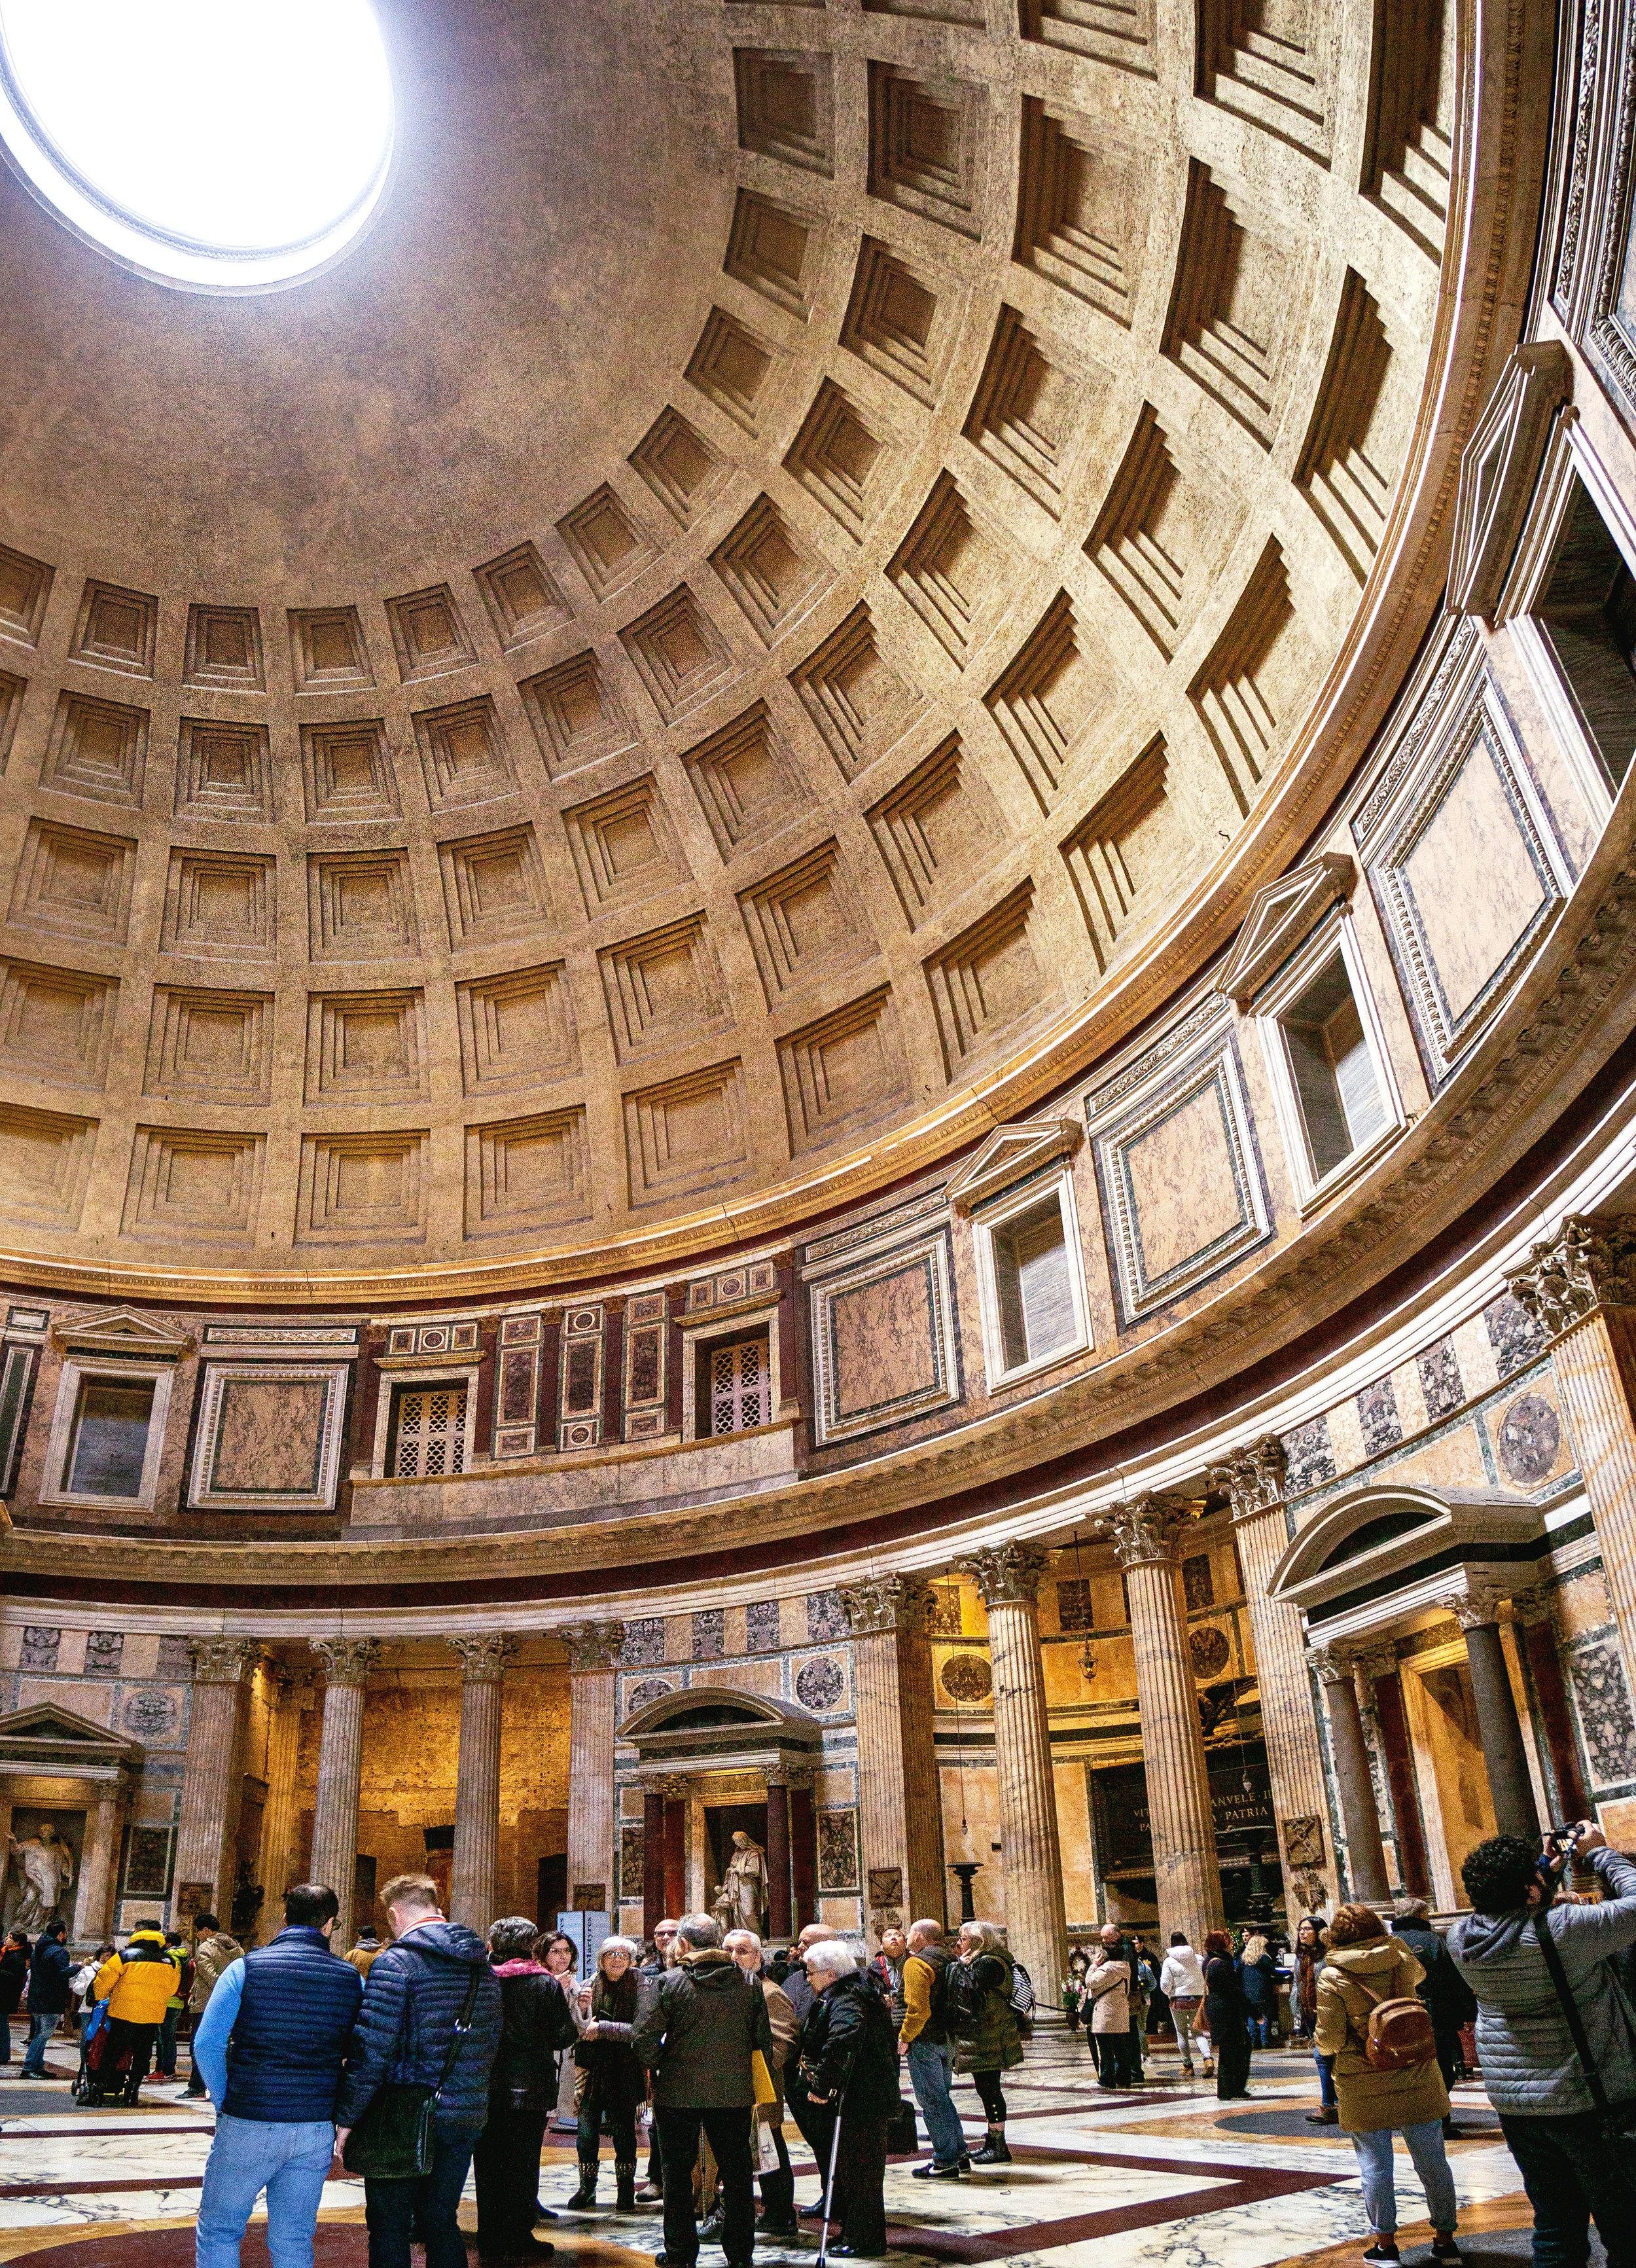 rome_pantheon_vickygood_travel_photography2sm.jpg